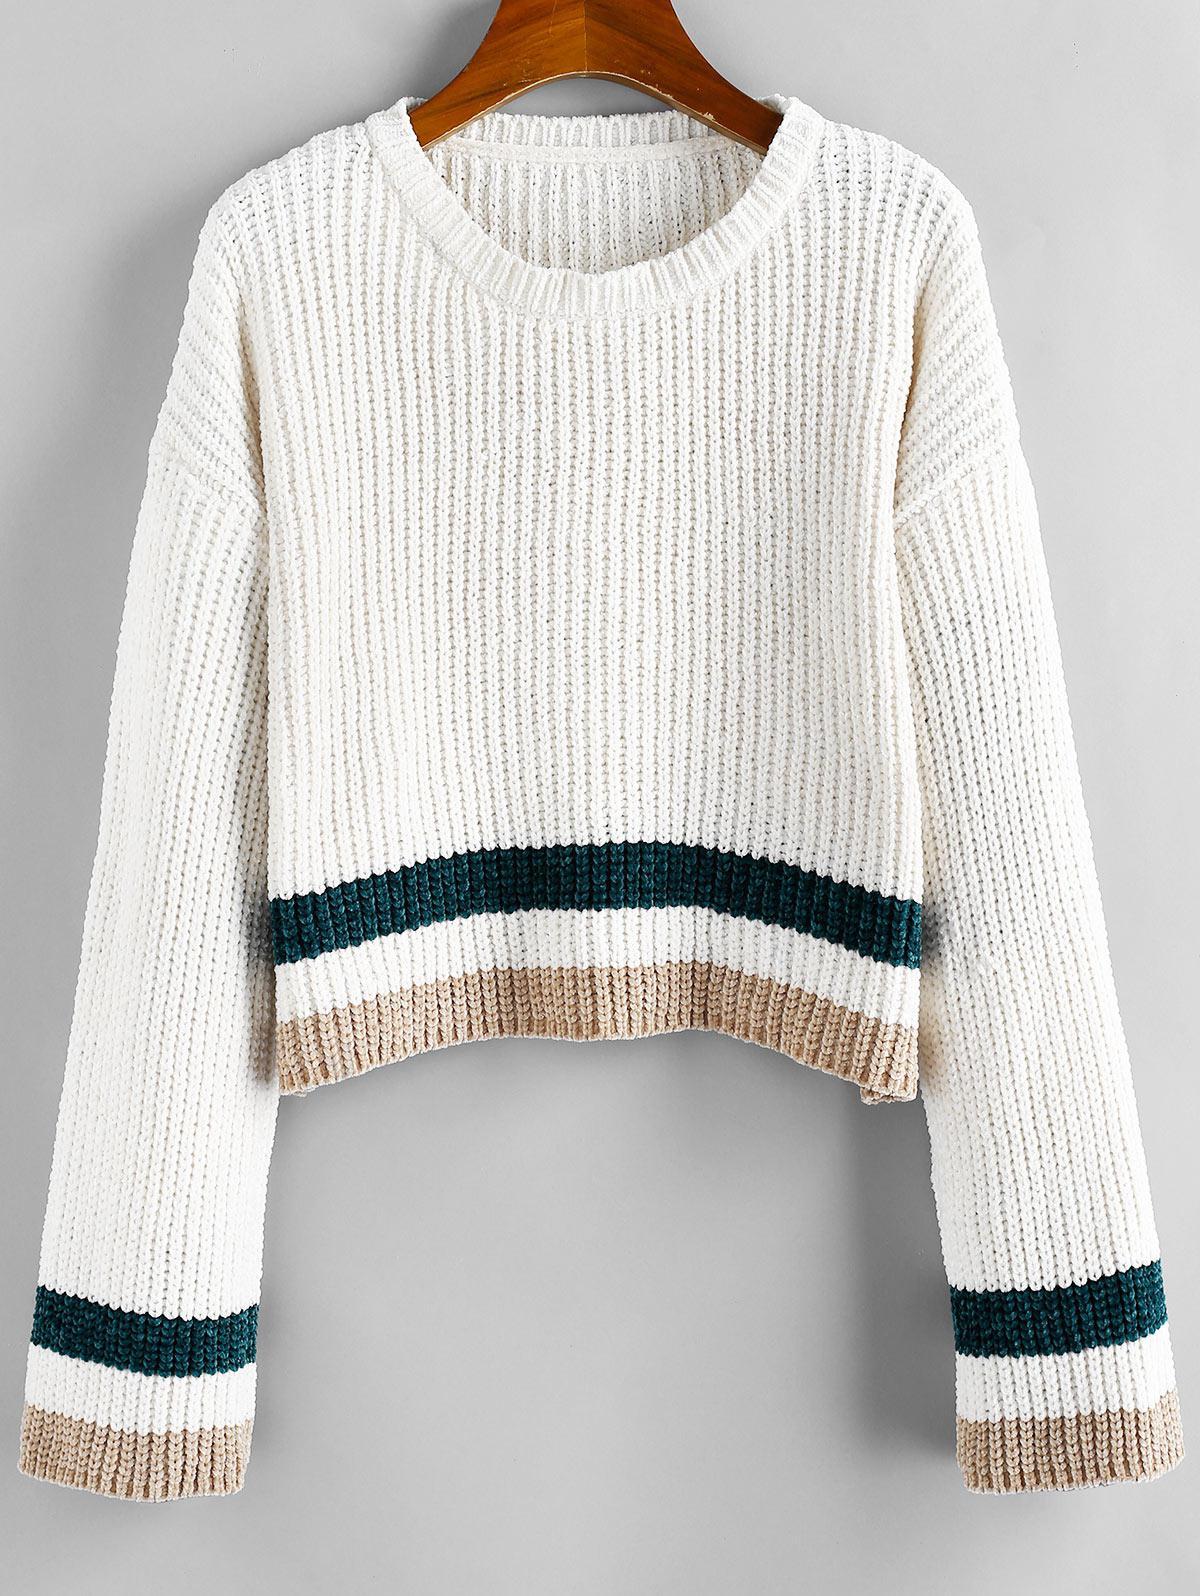 ZAFUL Striped Chenille Drop Shoulder Jumper Sweater